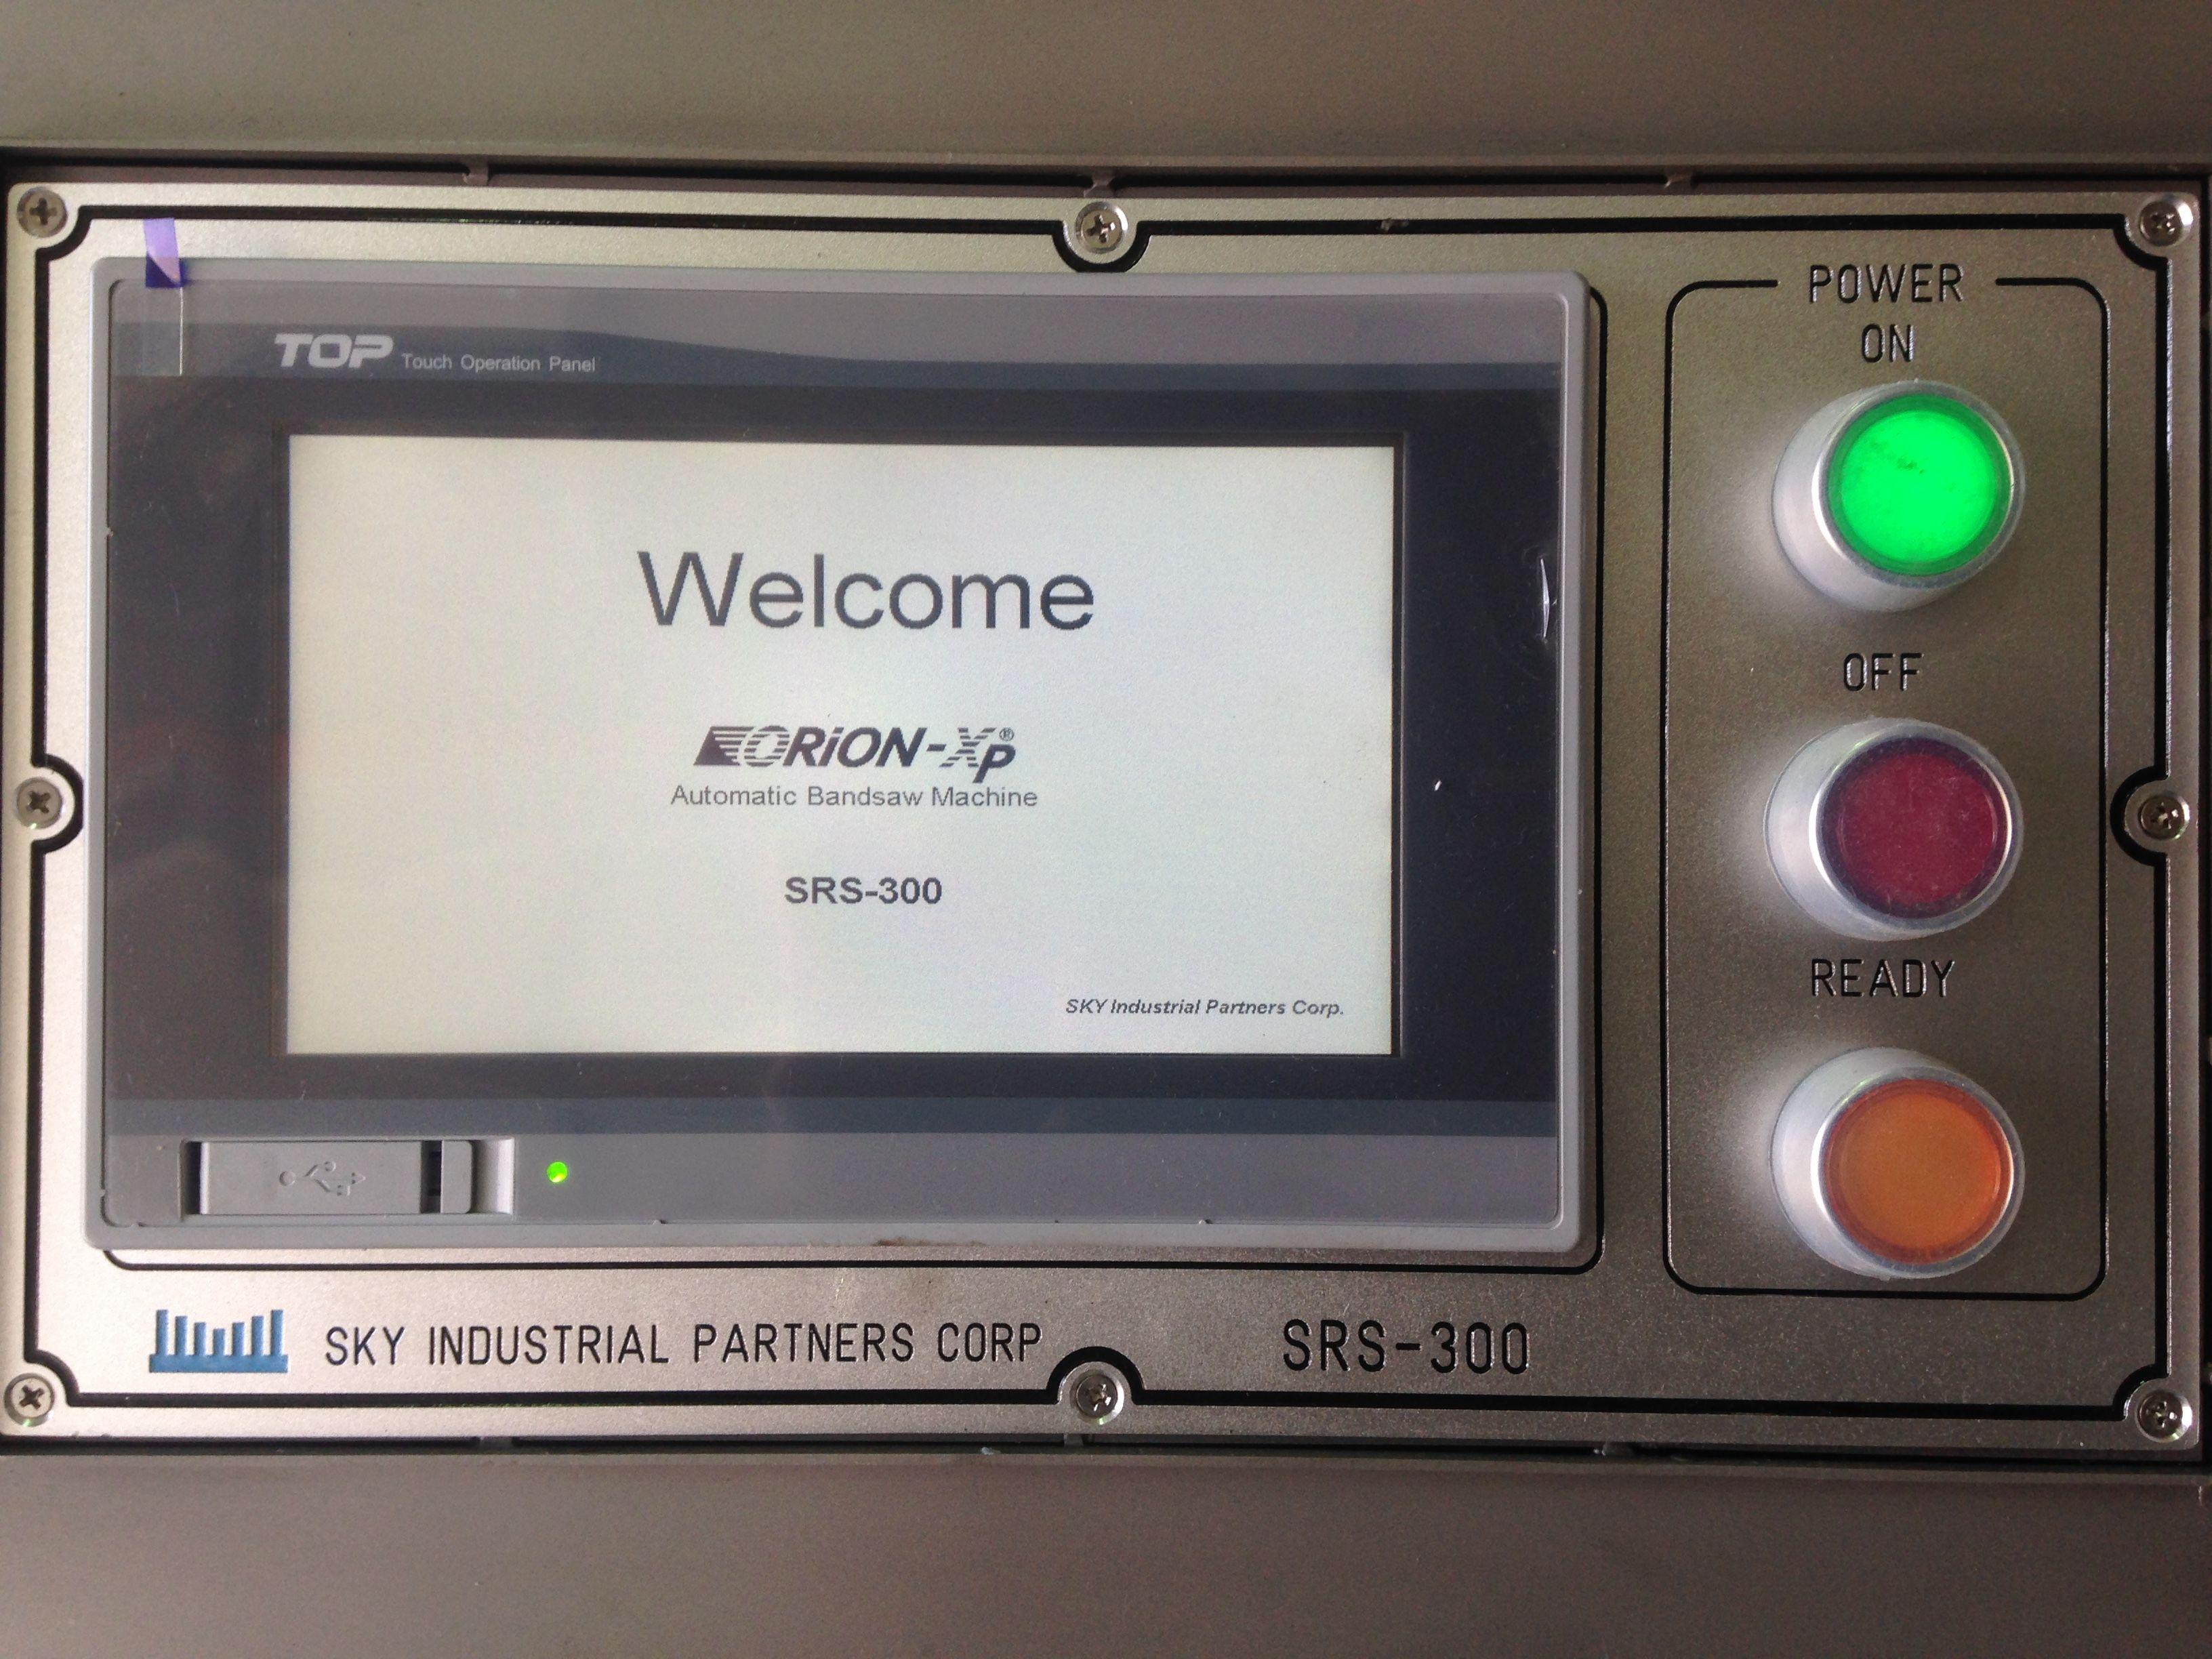 Wel e message on ORION Xp Automatic bone saw machine